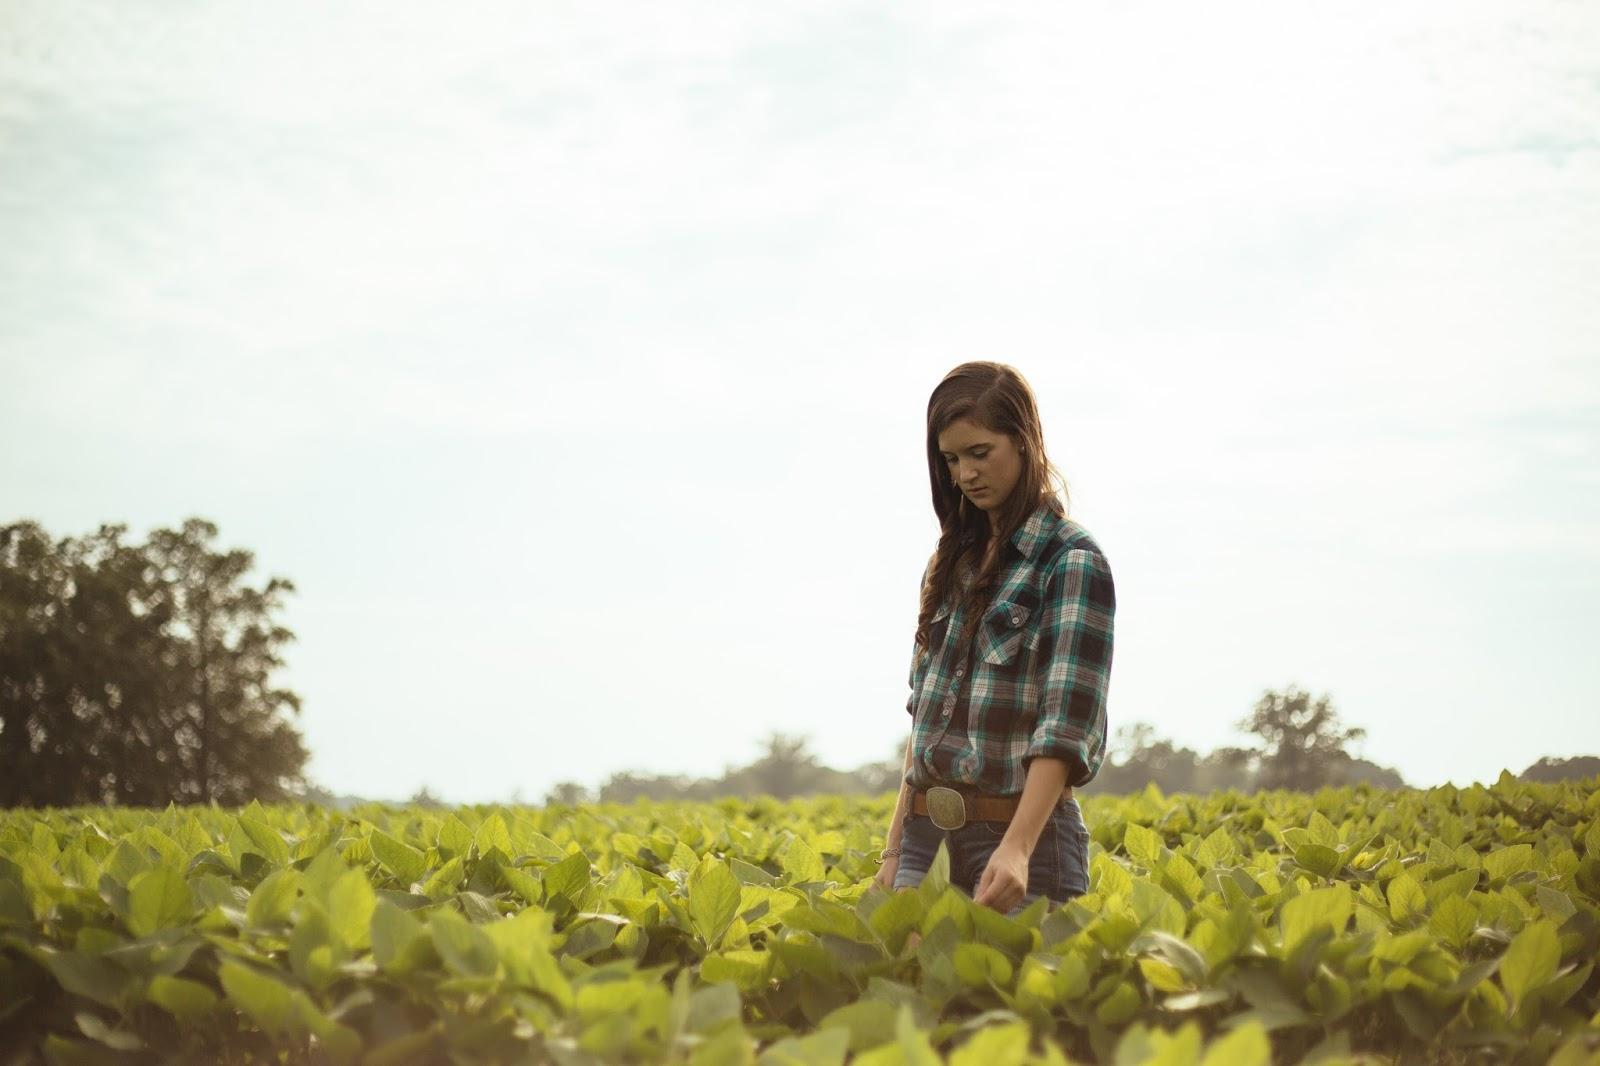 baylee+ivy+blog-9.jpg